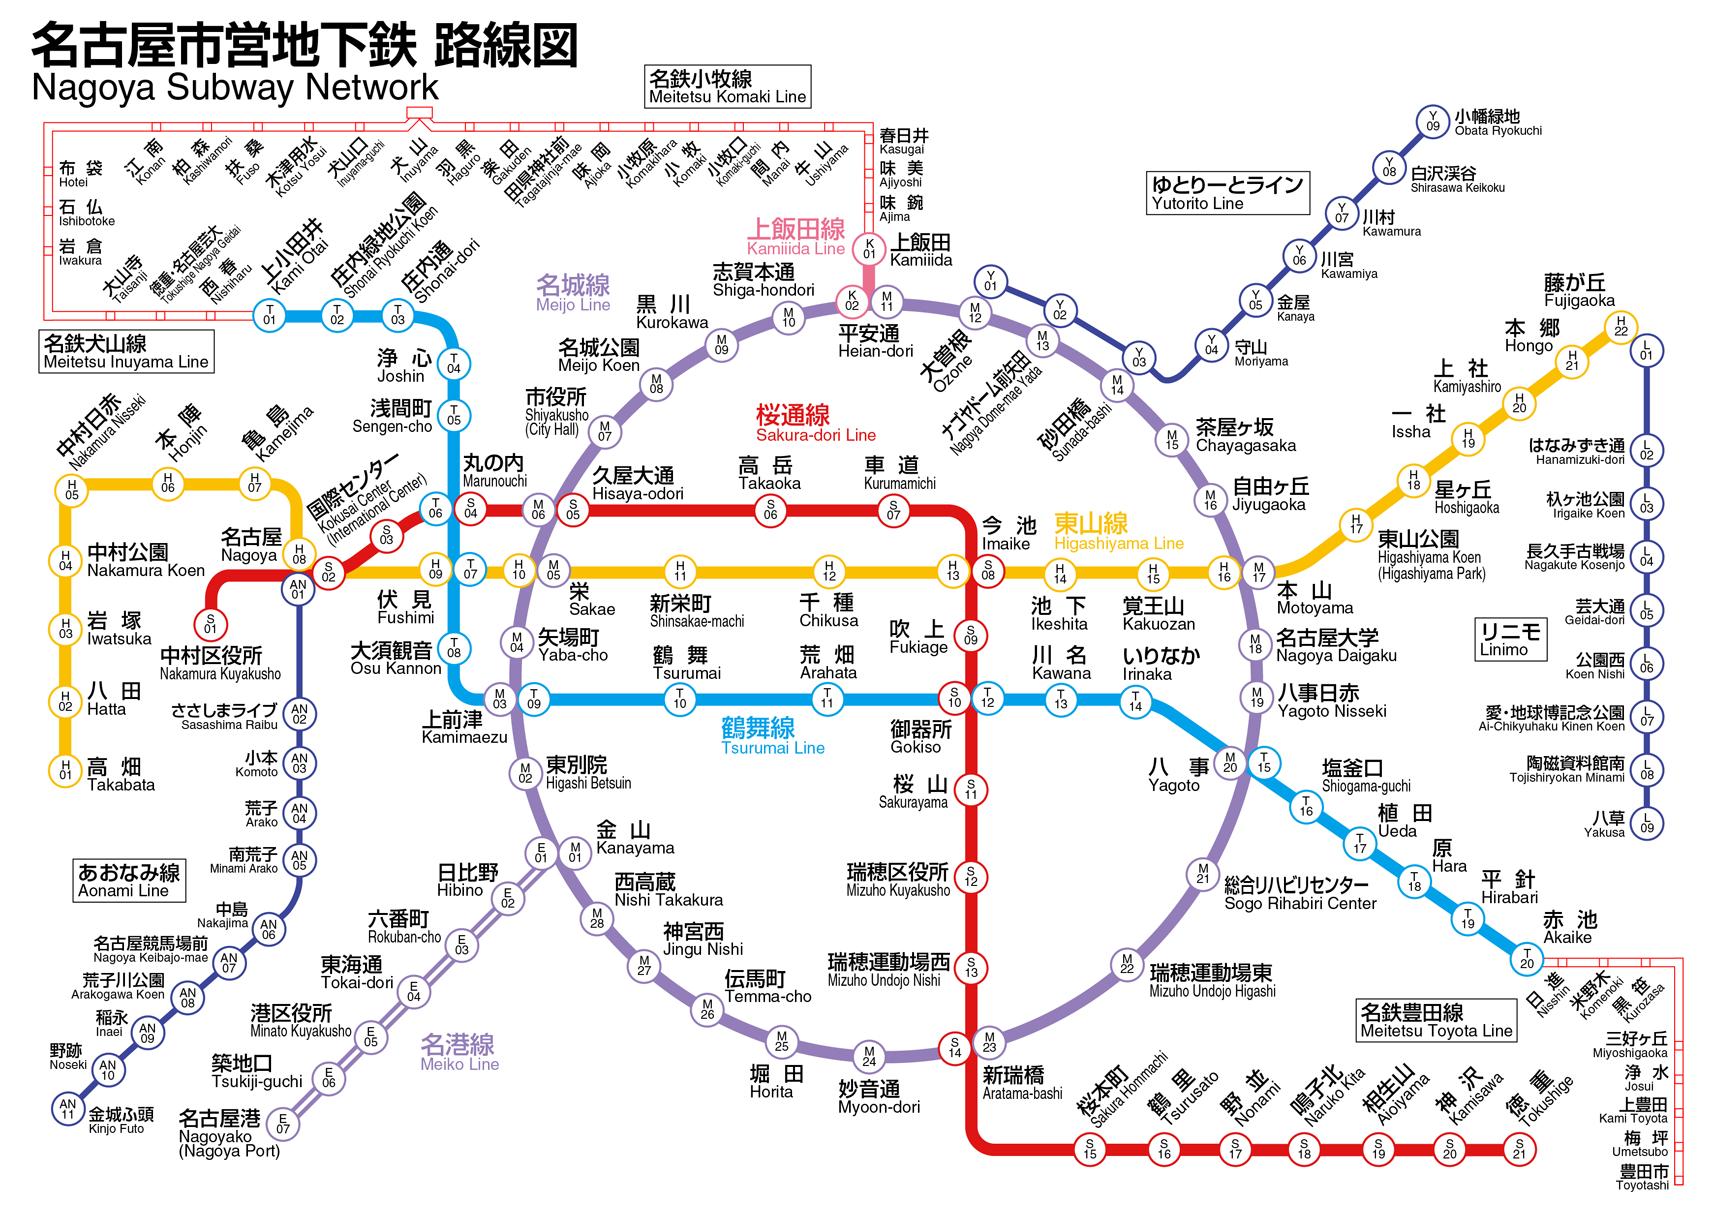 Nagoya Subway 일본 지하철 선로에 떨어진  20대 여성 구사일생